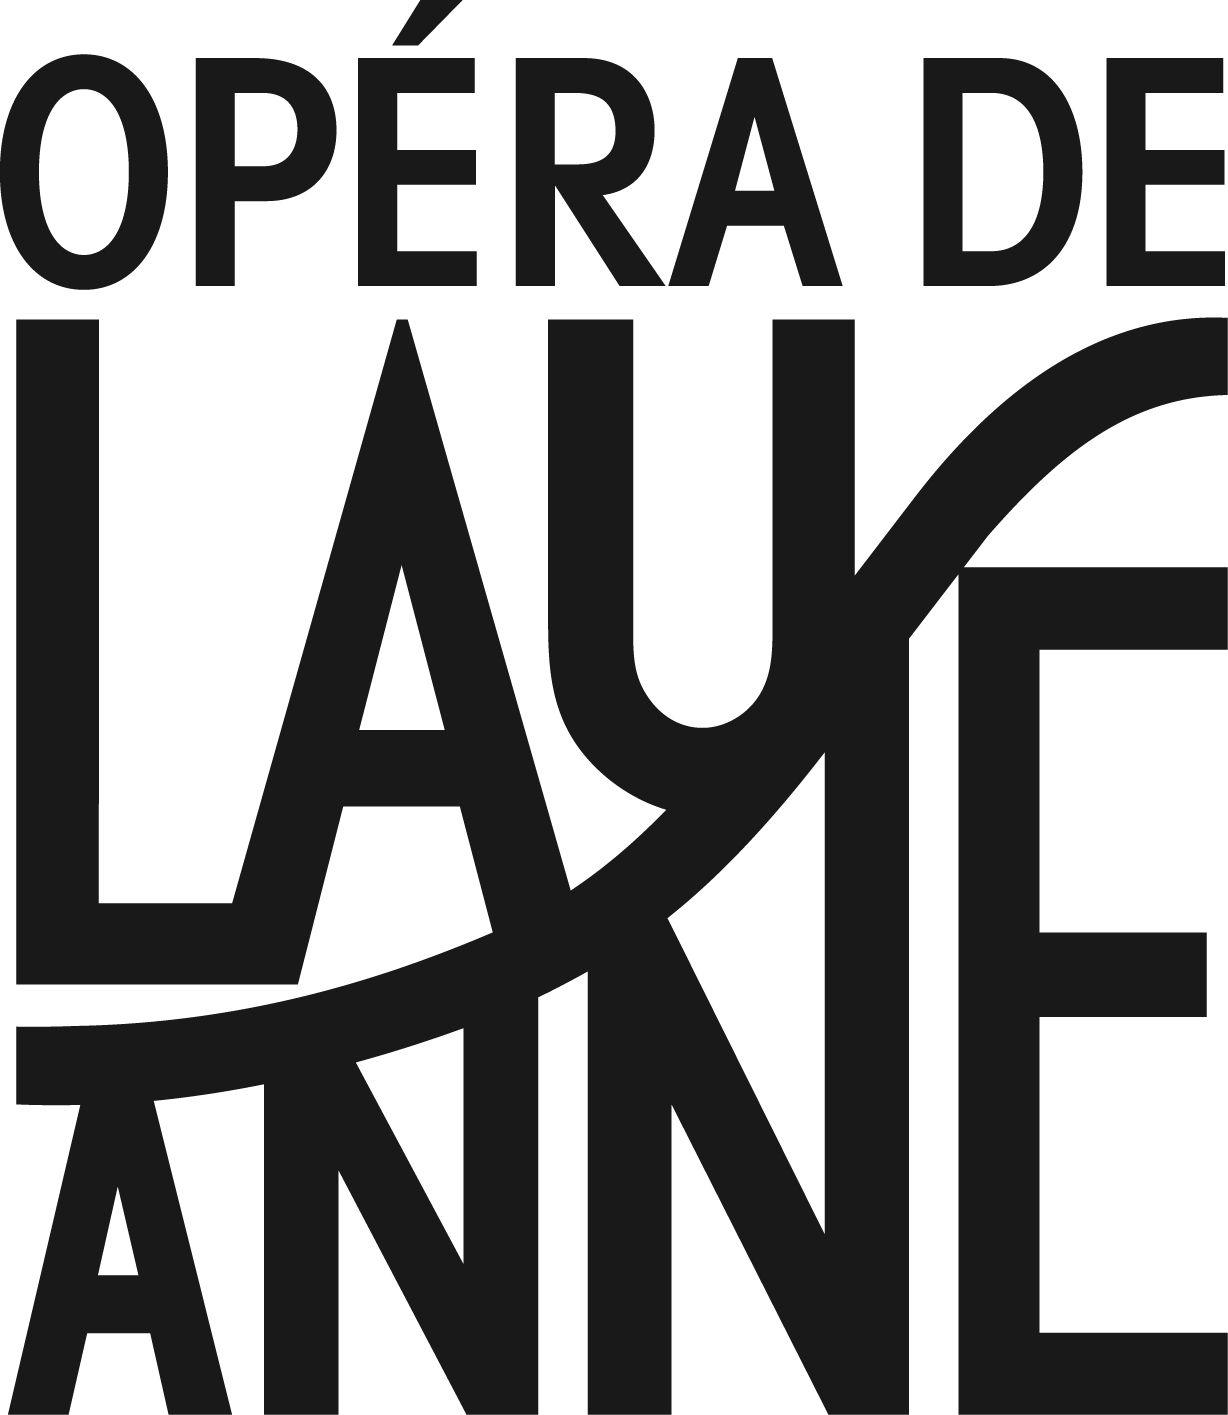 nouveau logo opera_noir.jpg